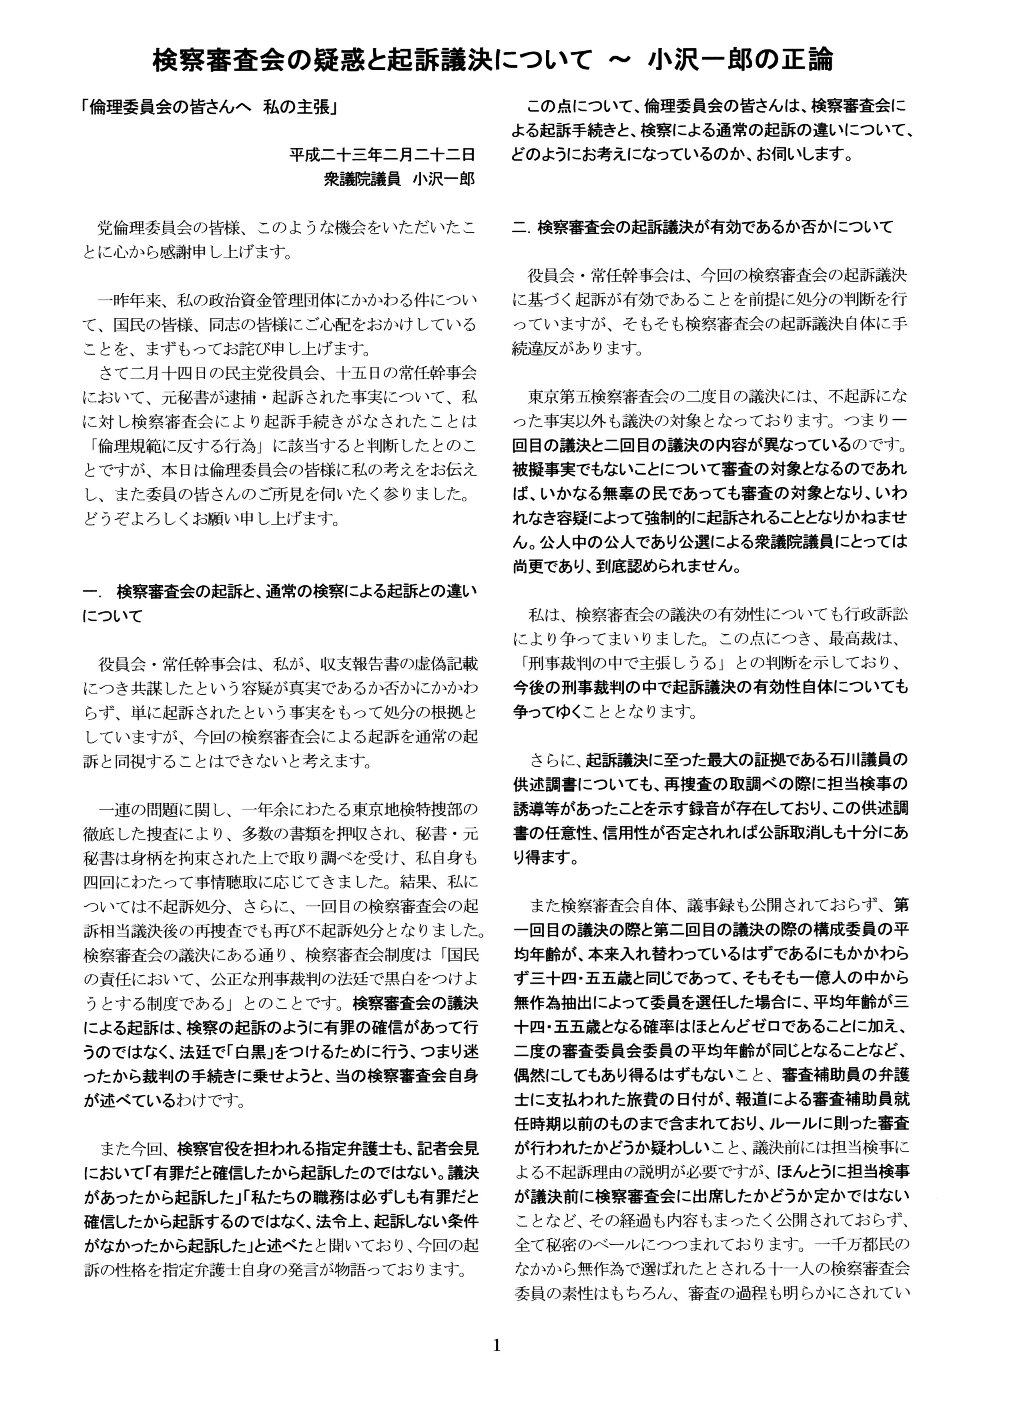 pdf 1枚を両面印刷